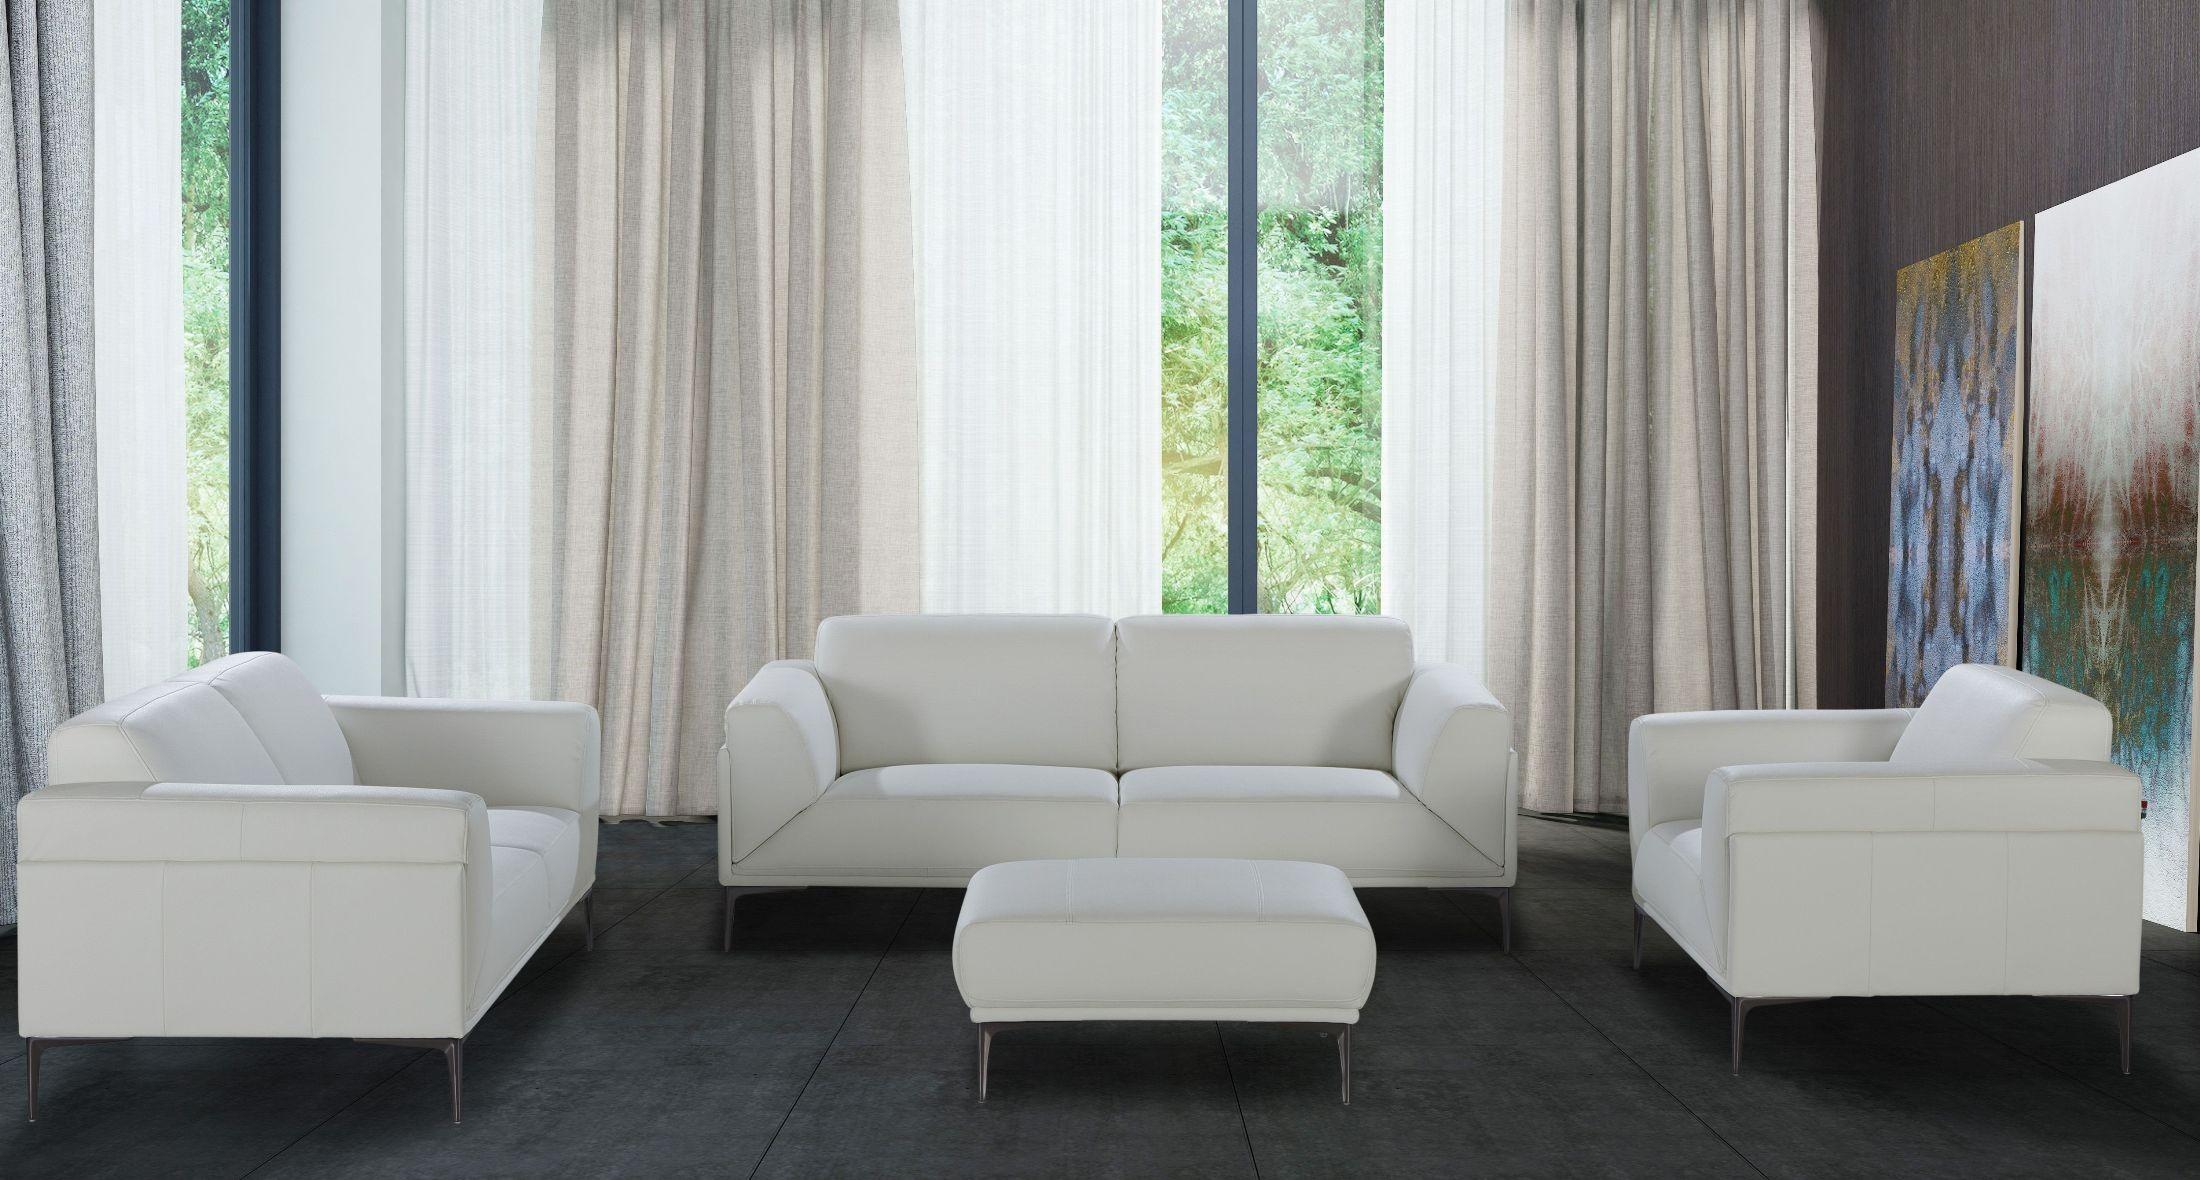 davos white leather living room set 18248 s j m